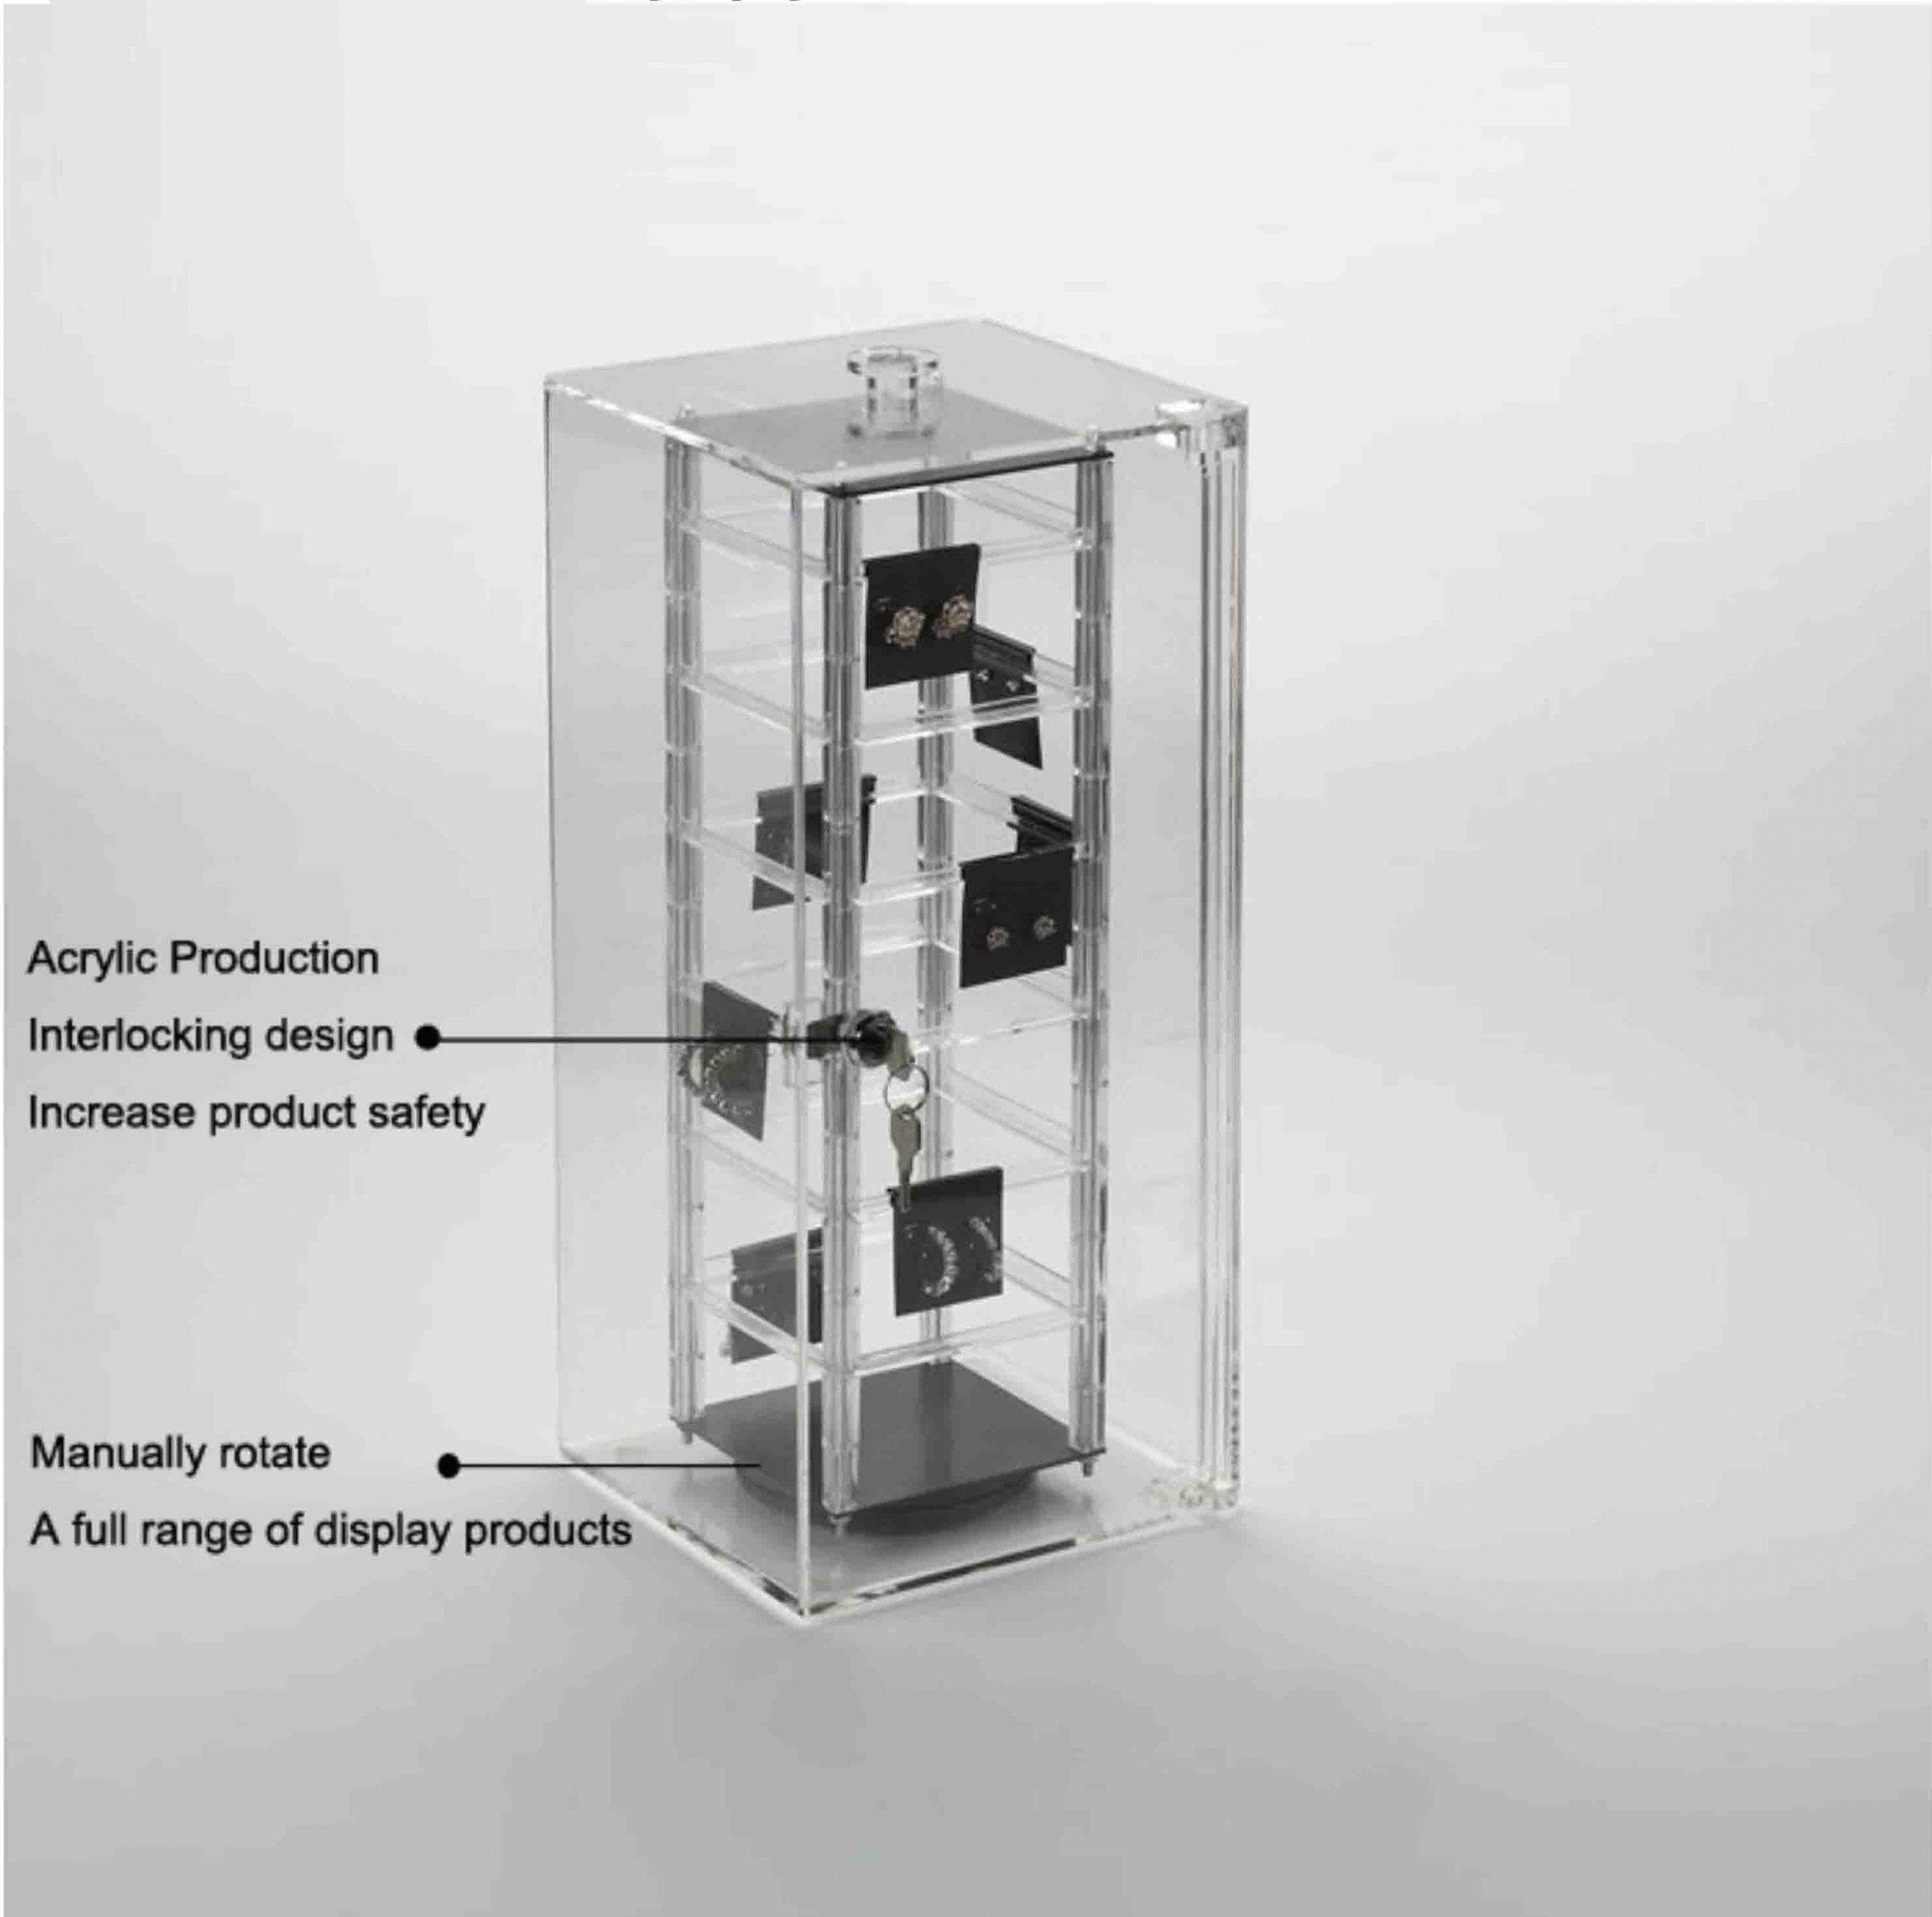 Rotating Jewelry Display Case with Lock HT1b5dGFUJbXXagOFbXF scaled